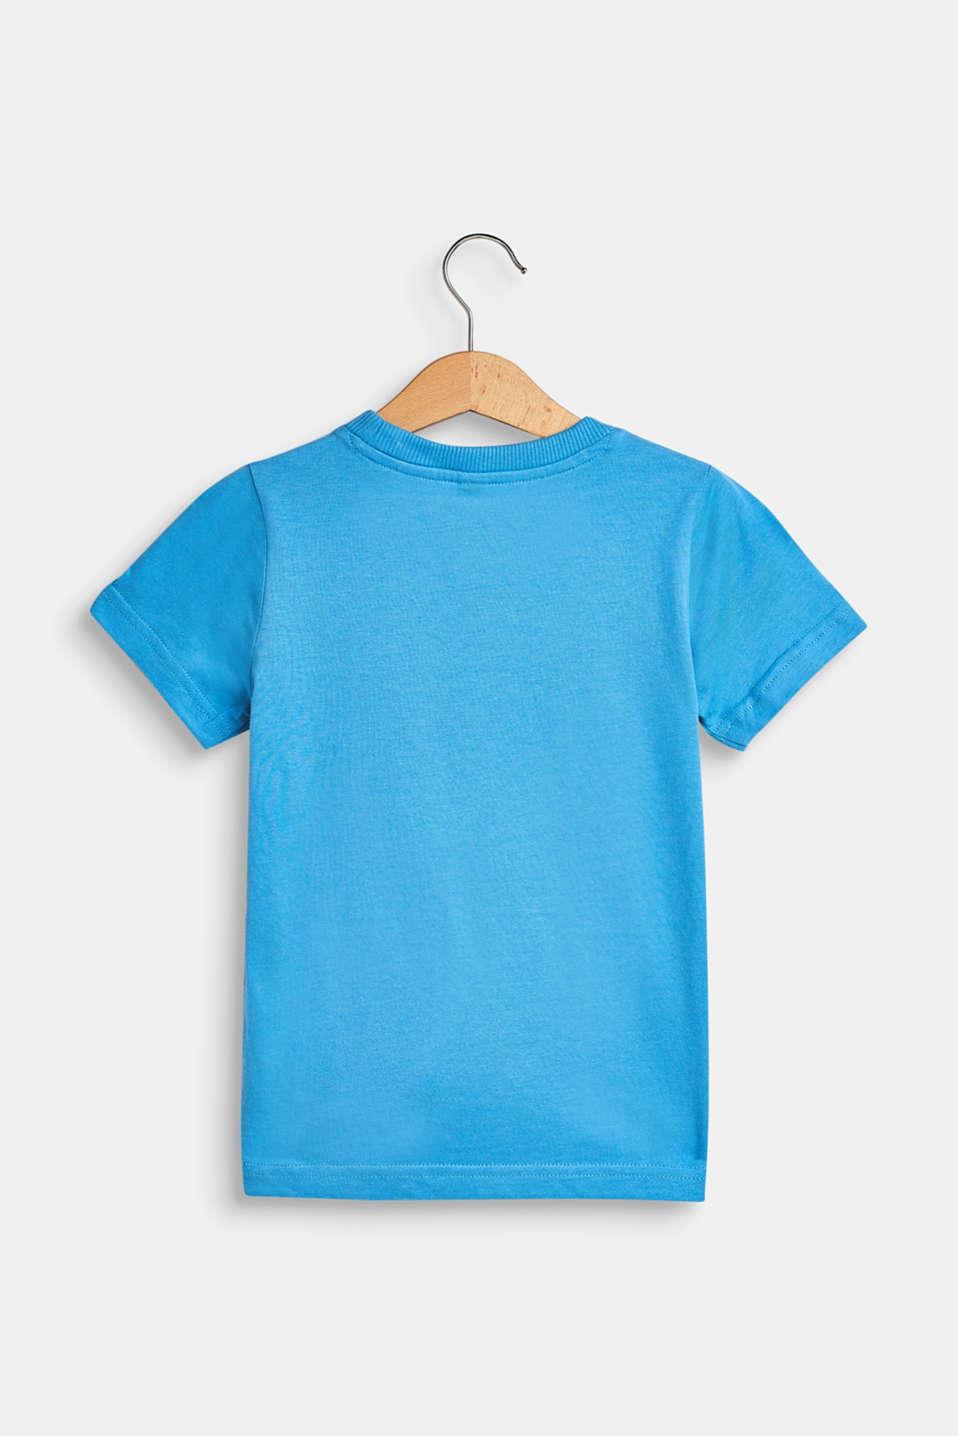 T-shirt with a motif pocket, 100% cotton, AZUR BLUE, detail image number 1